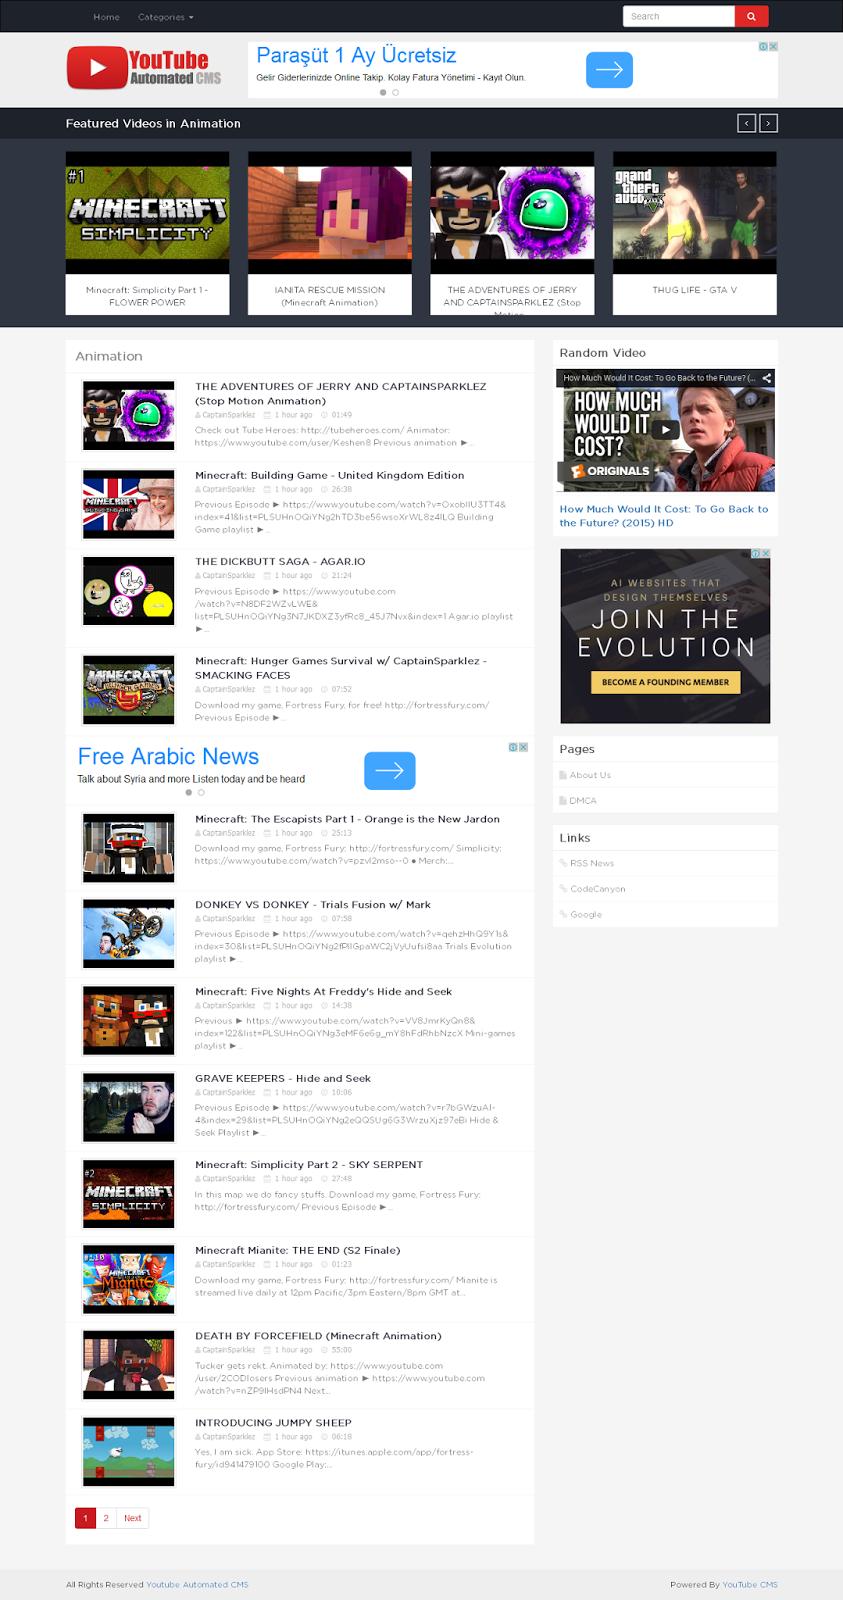 Youtube Automated Cms By Teedeskdev: حصريا حمل مجانا سكربت موقع فيديوهات YouTube Automated CMS